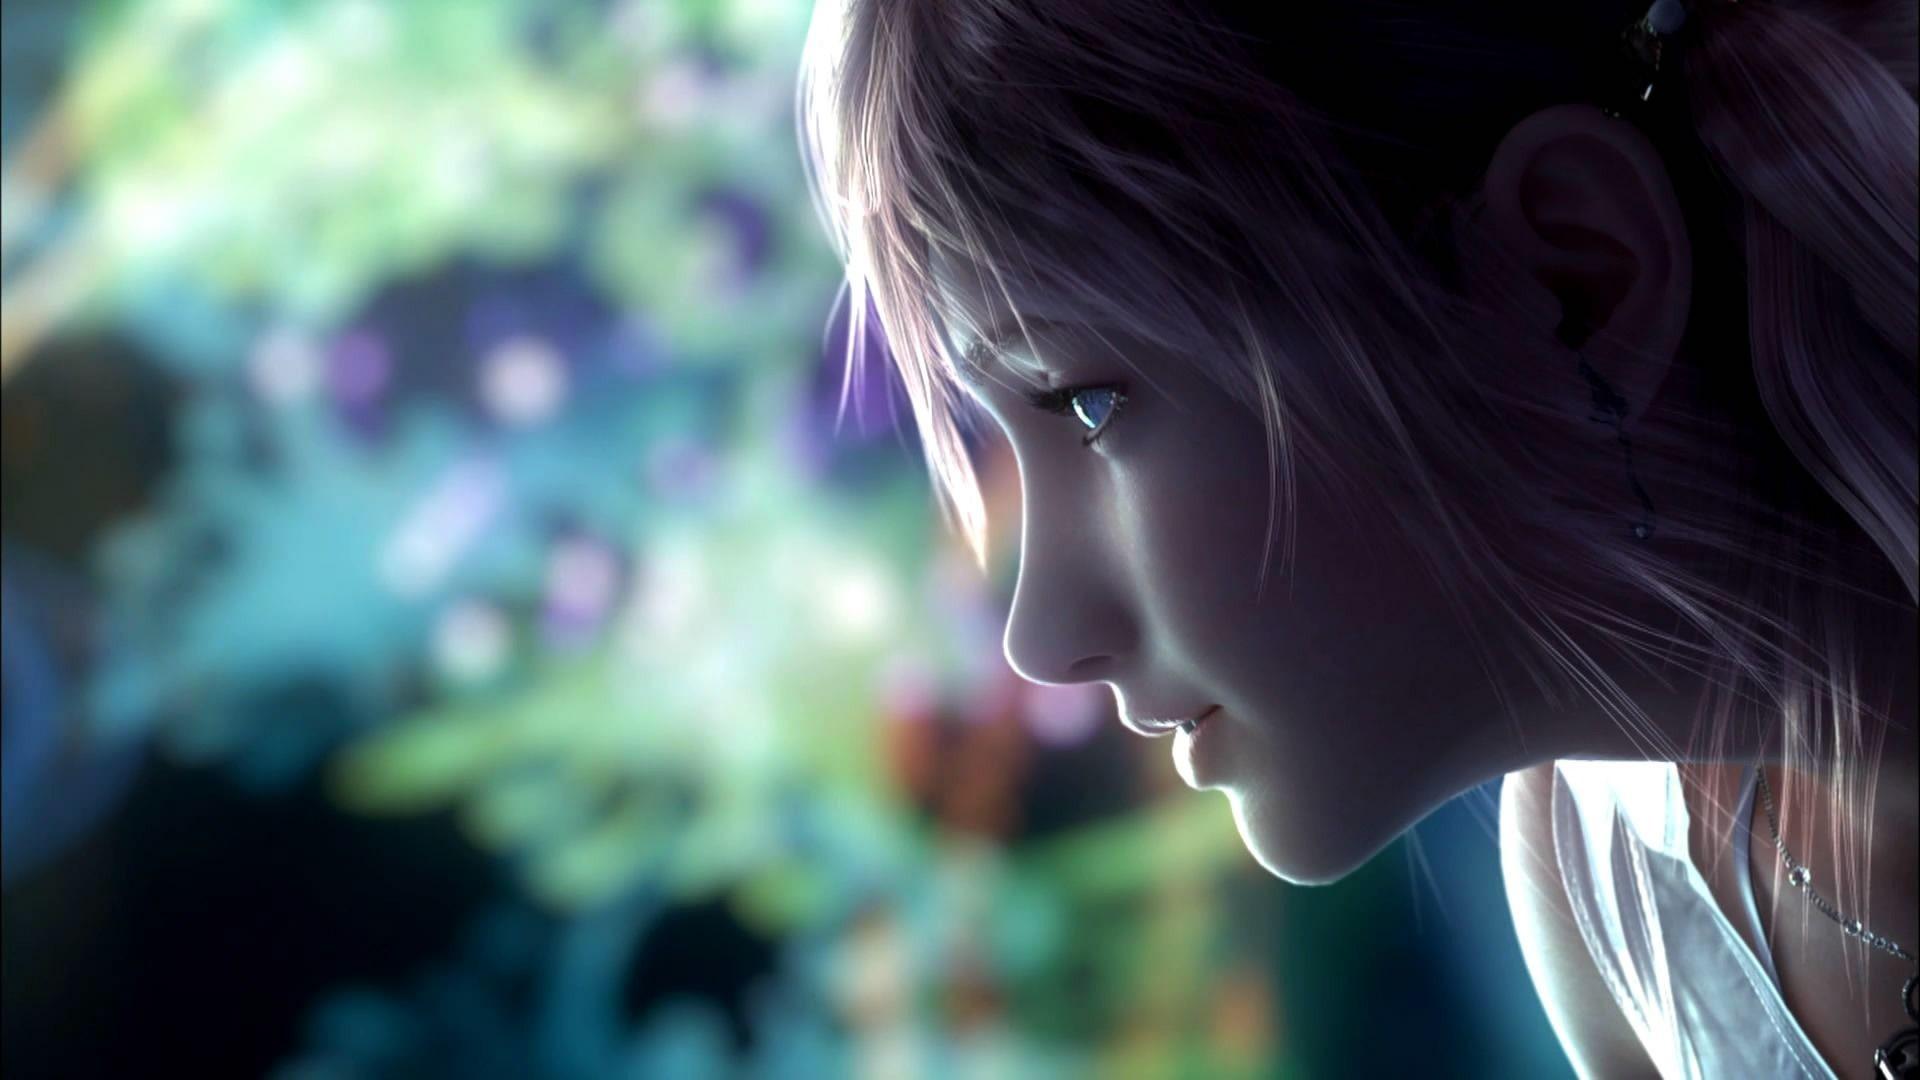 Final Fantasy Xiii wallpaper jpg x desktop wallpaper 170003